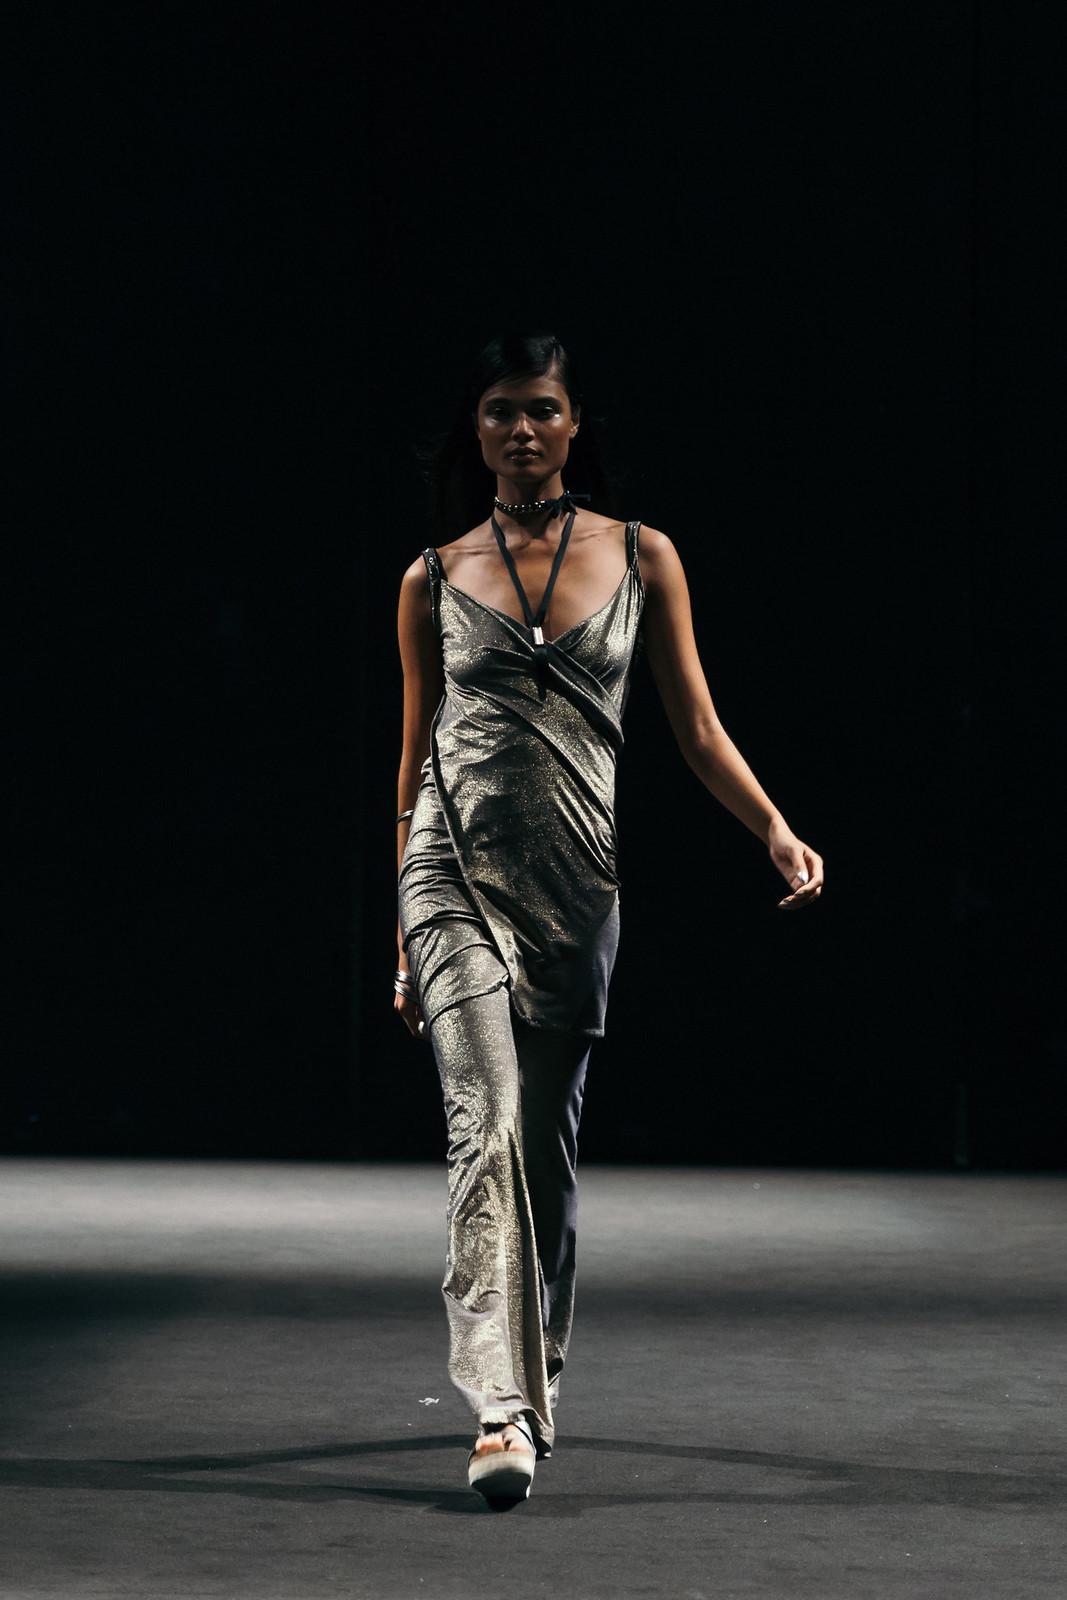 Jessie Chanes - Seams for a desire - 080 Bacelona Fashion #080bcnfasion -37